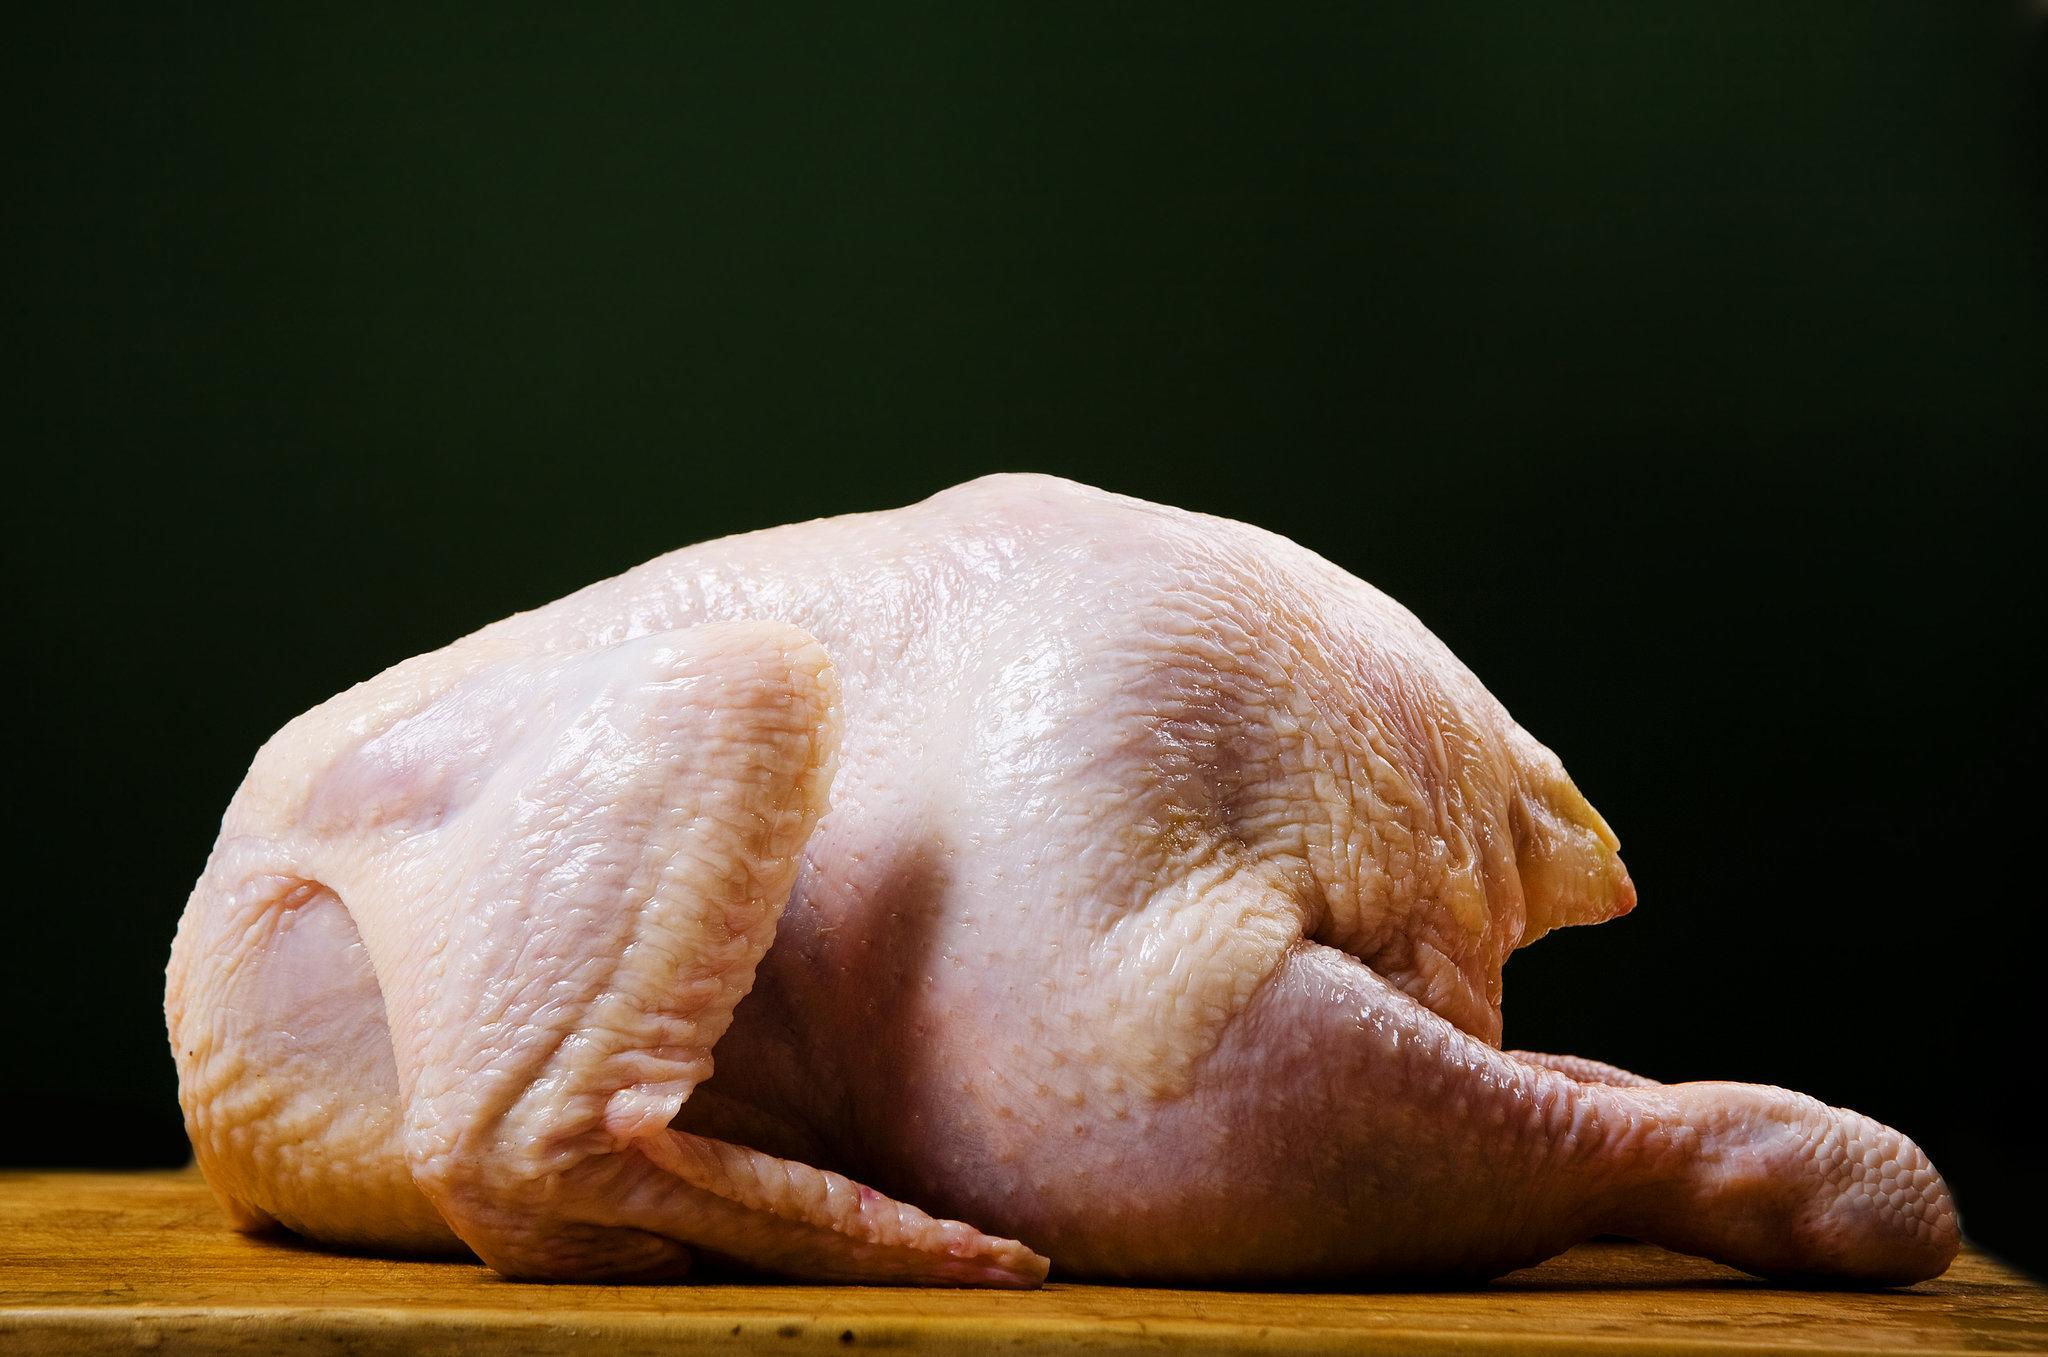 turkey defrost breast a